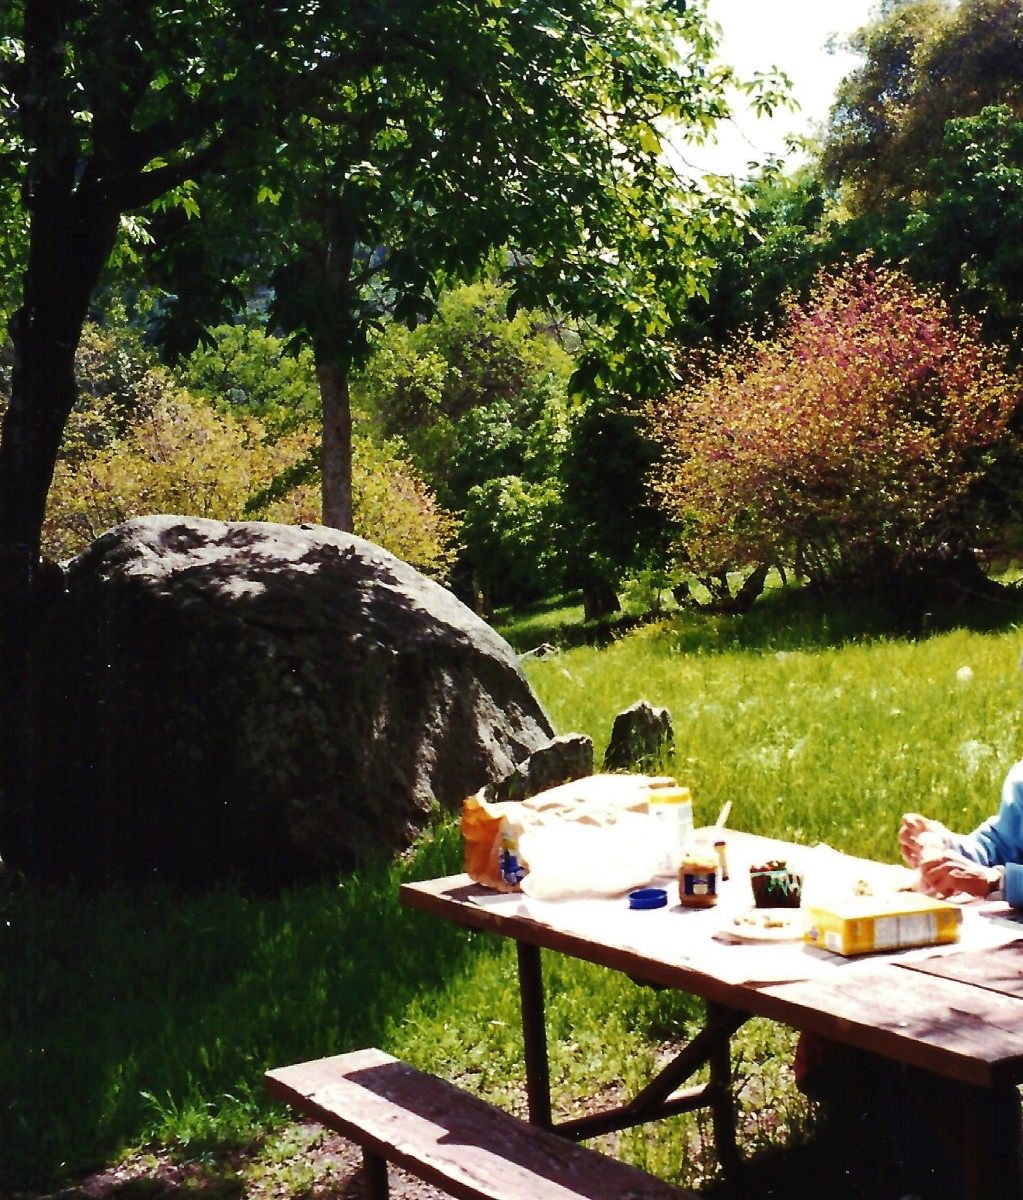 Great picnic spot